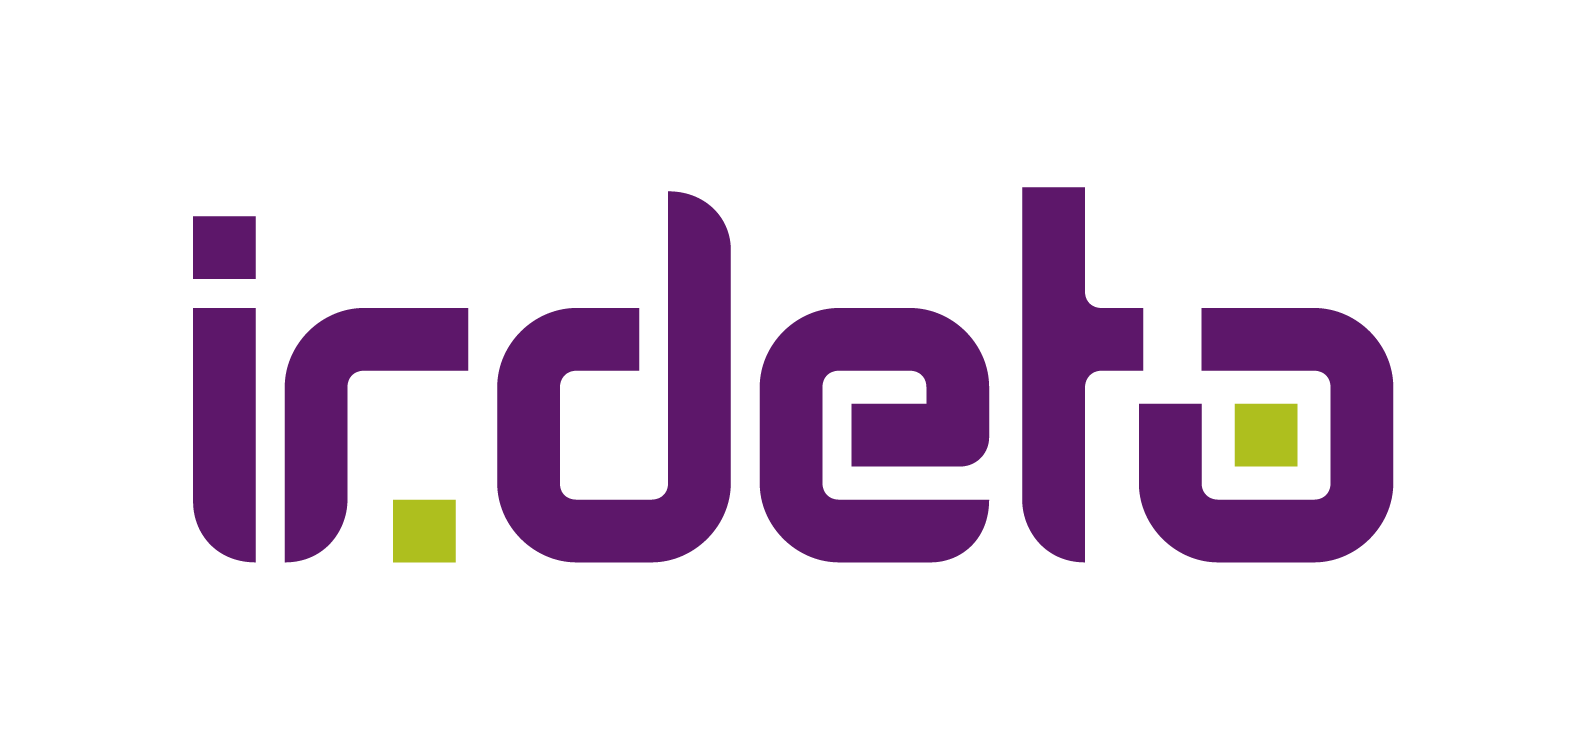 UniqCast partner Irdeto